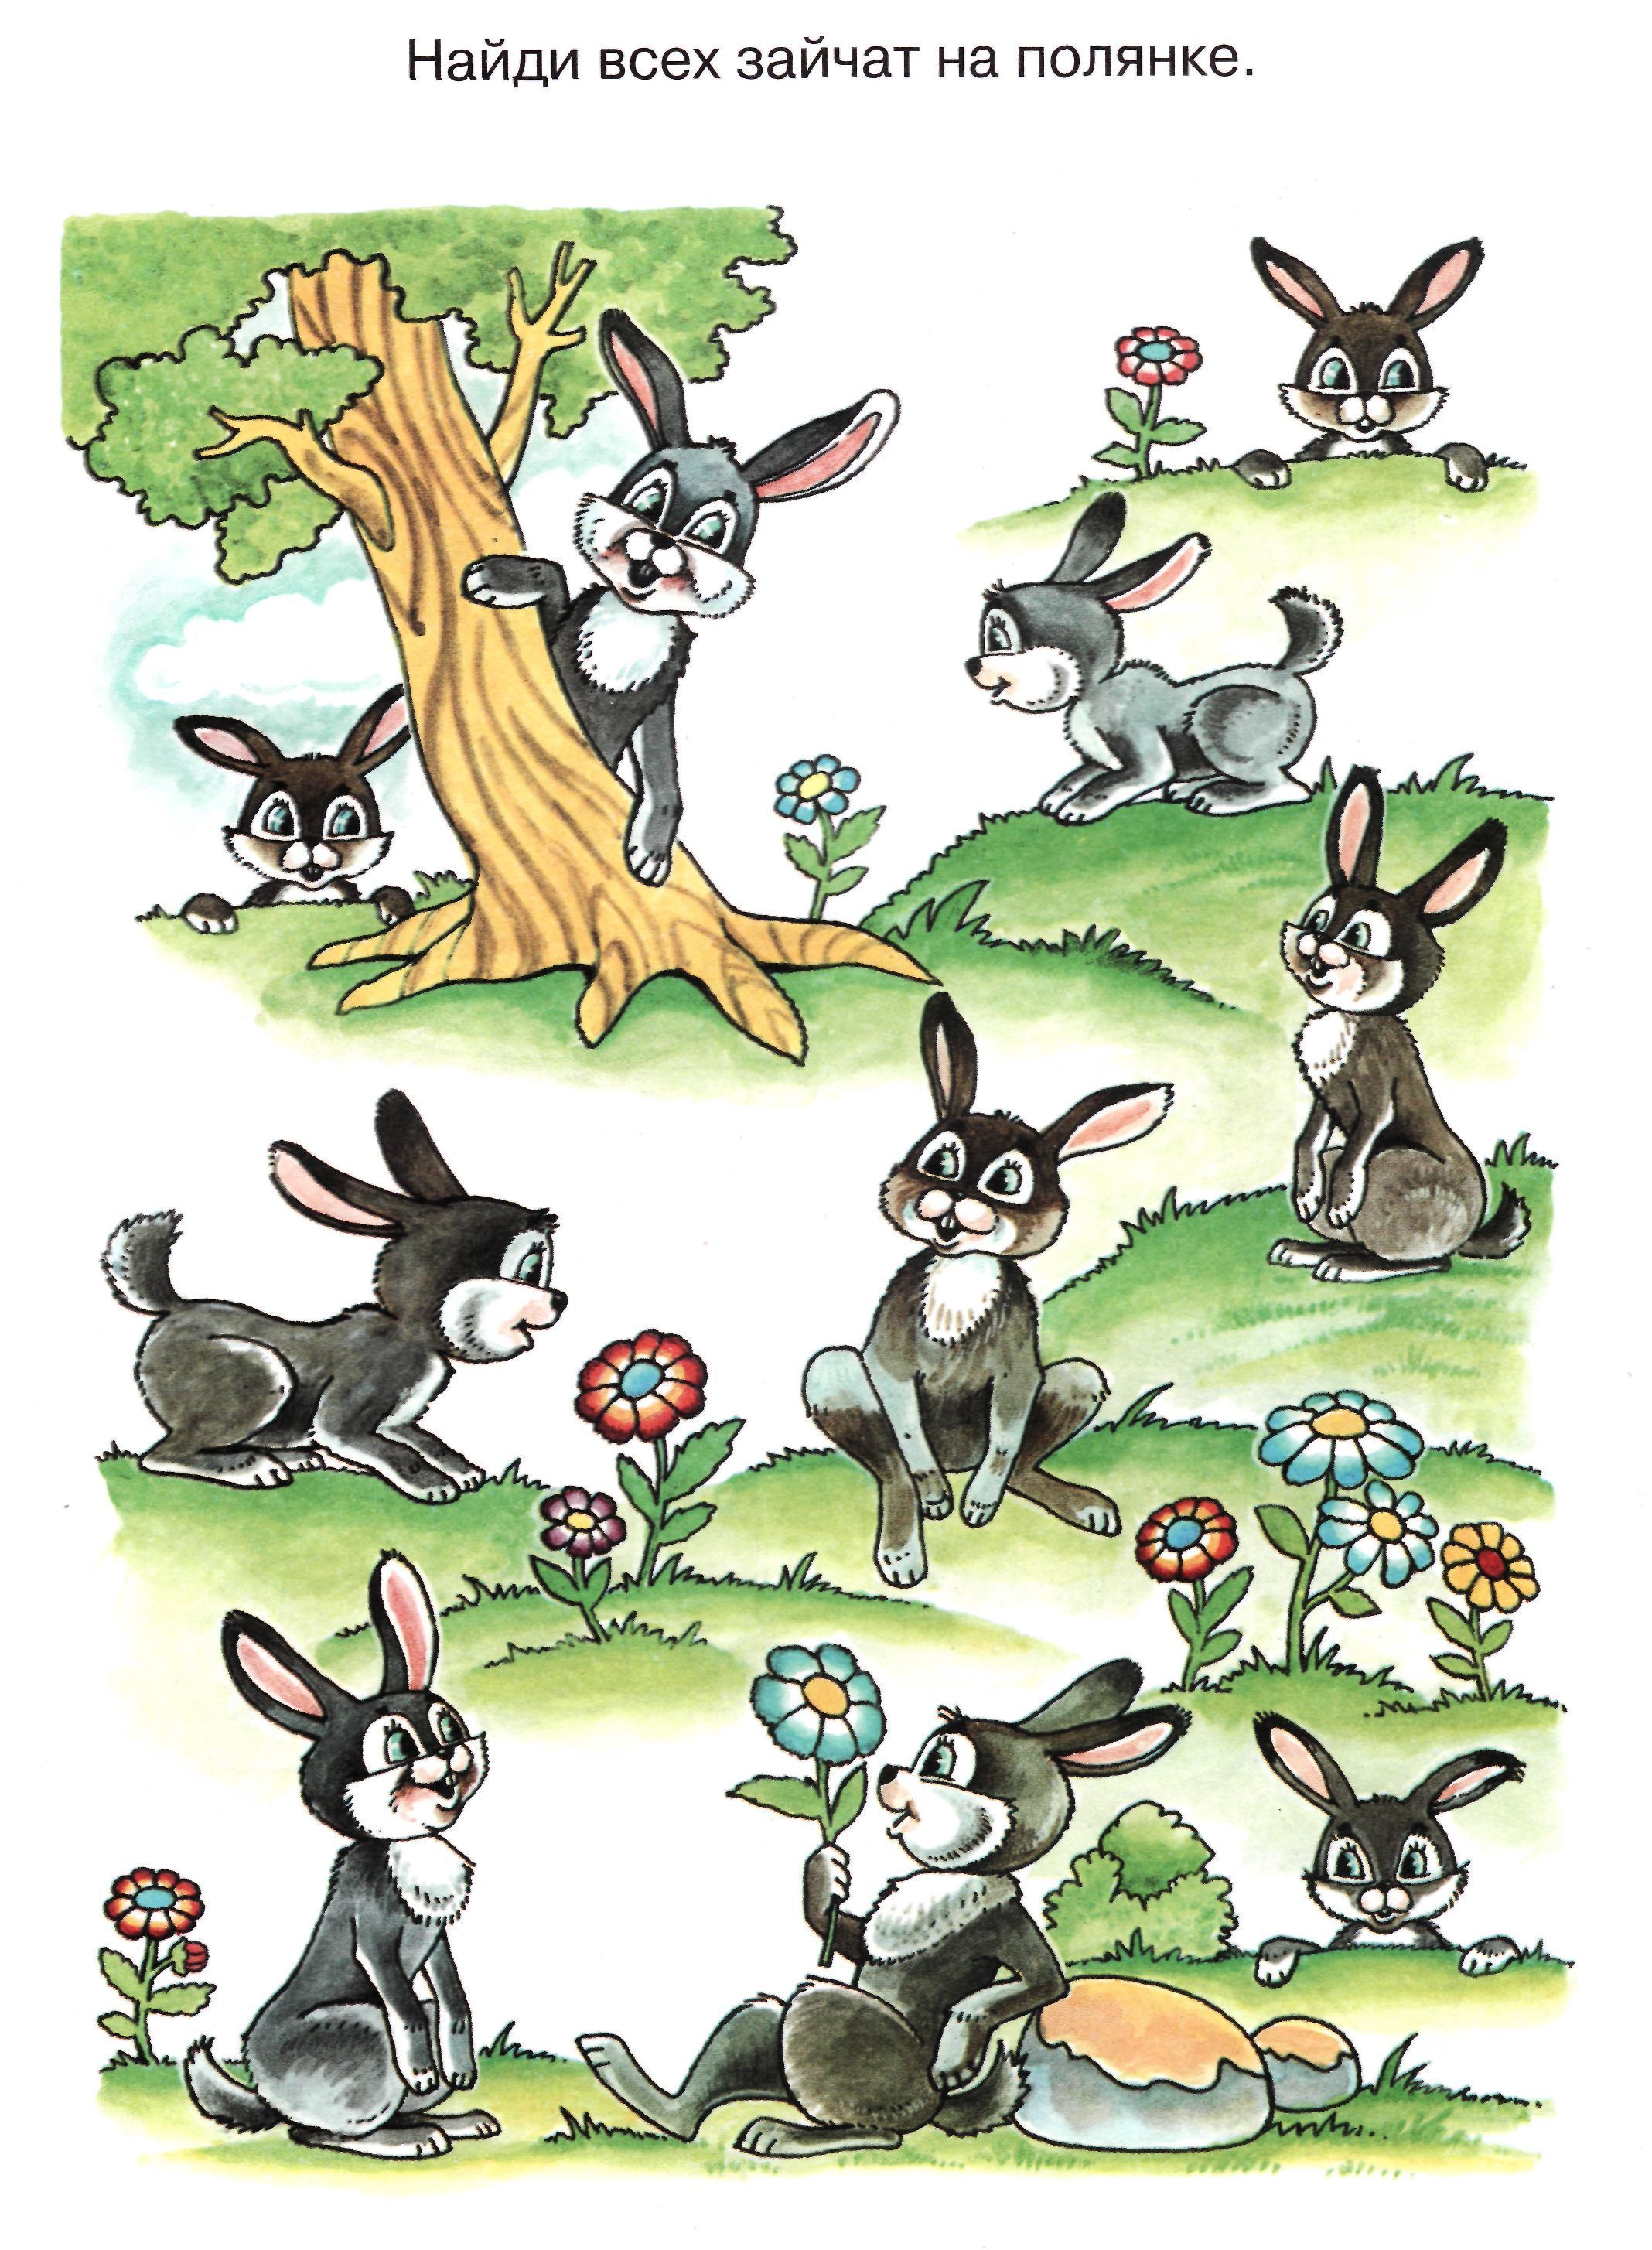 Картинка найдите зайчика